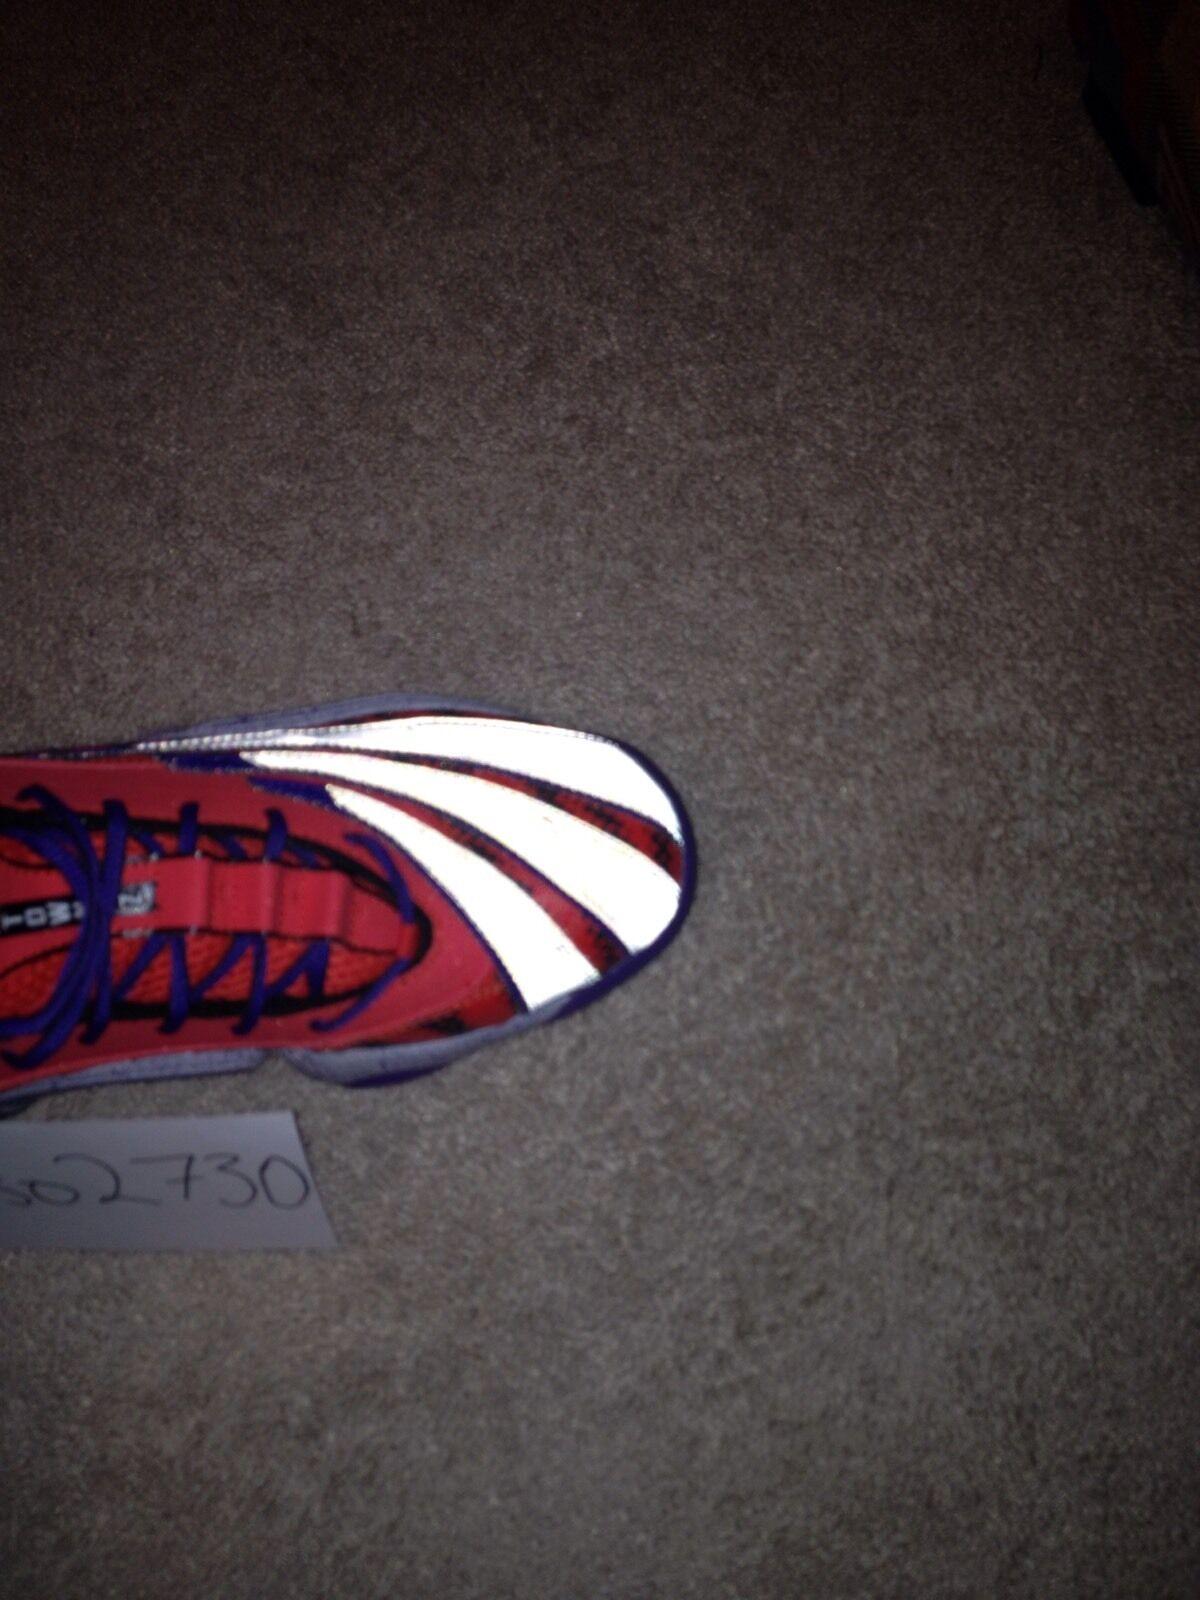 adidas damian lillard vrai roy taille 10 limited ed ed ed seuleHommes t 530.authentique 7e36ea